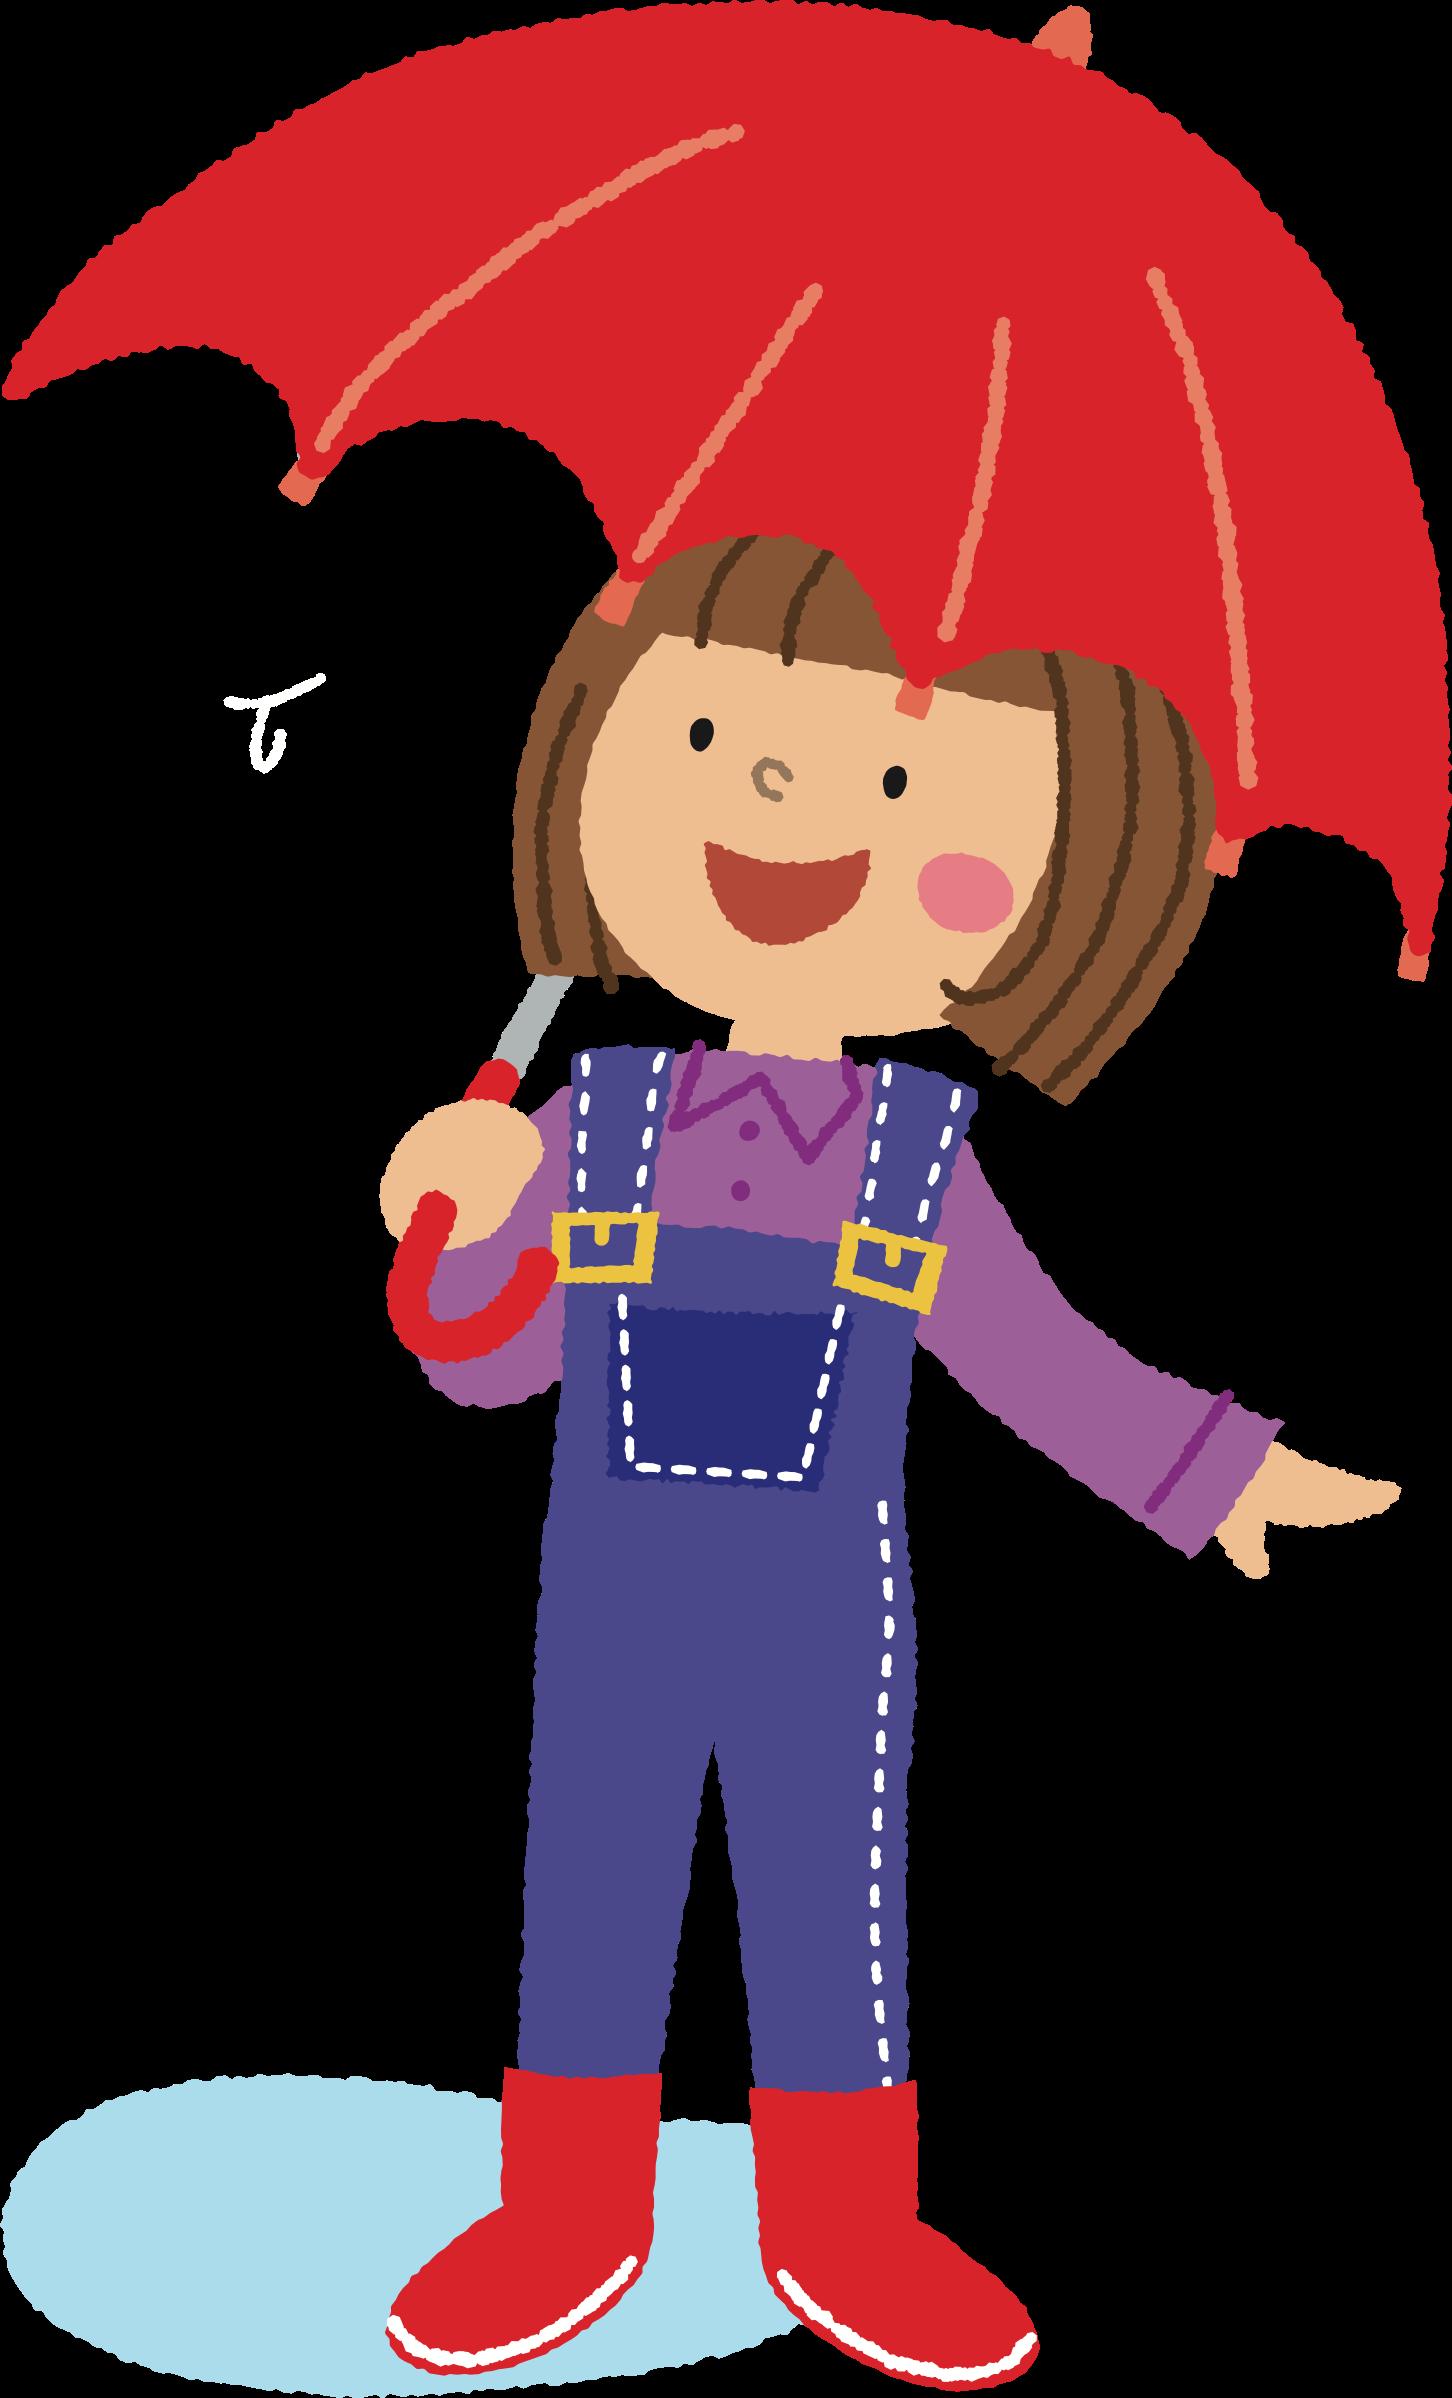 Clipart umbrella public domain. Girl with big image